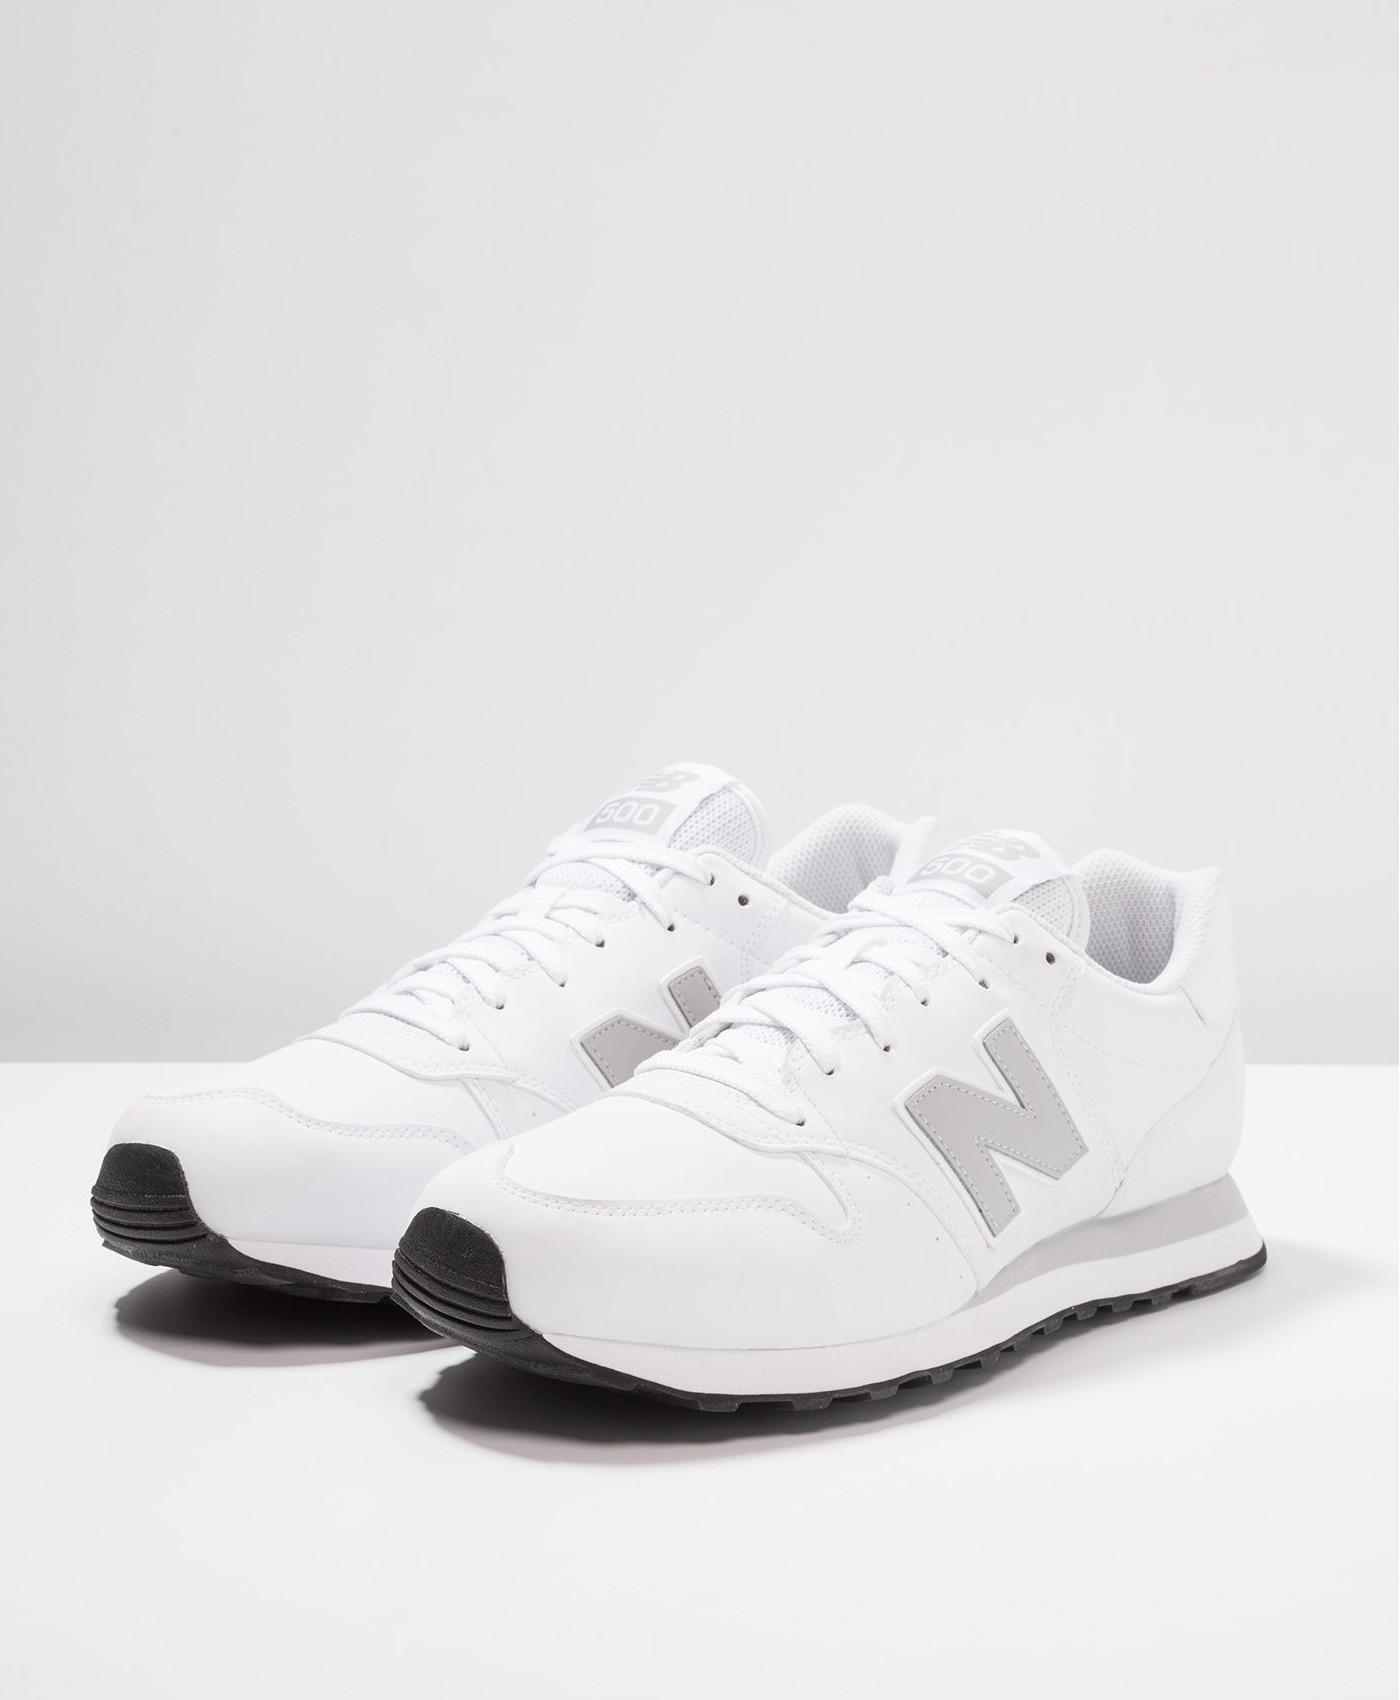 New Balance Gm 500 Sport Schuhe Shoe Sneakers sportswear lifestyle Weiß Silber